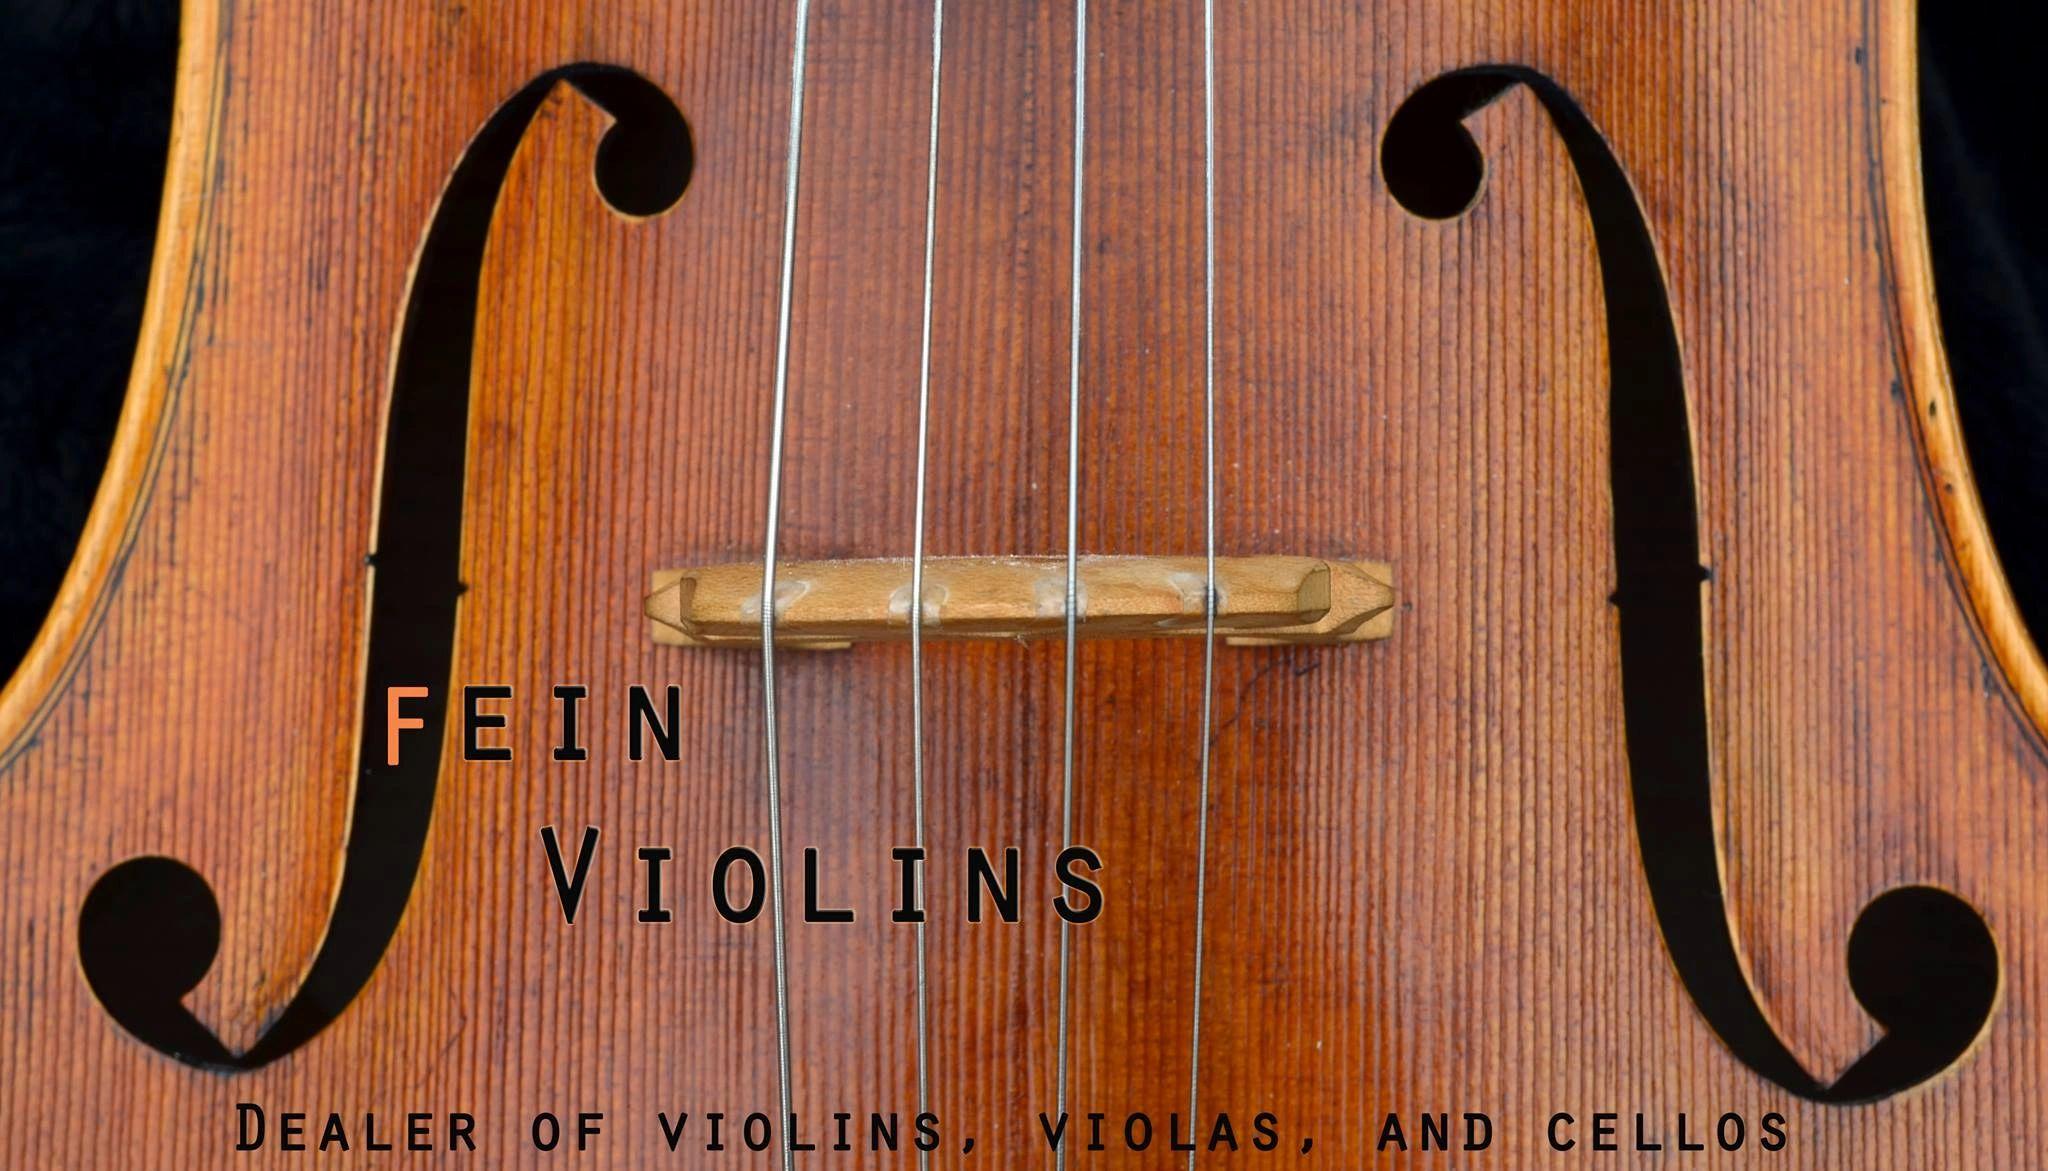 Fein Violins, Ltd  - Stradivarius Model, Violins, Violas, Cellos